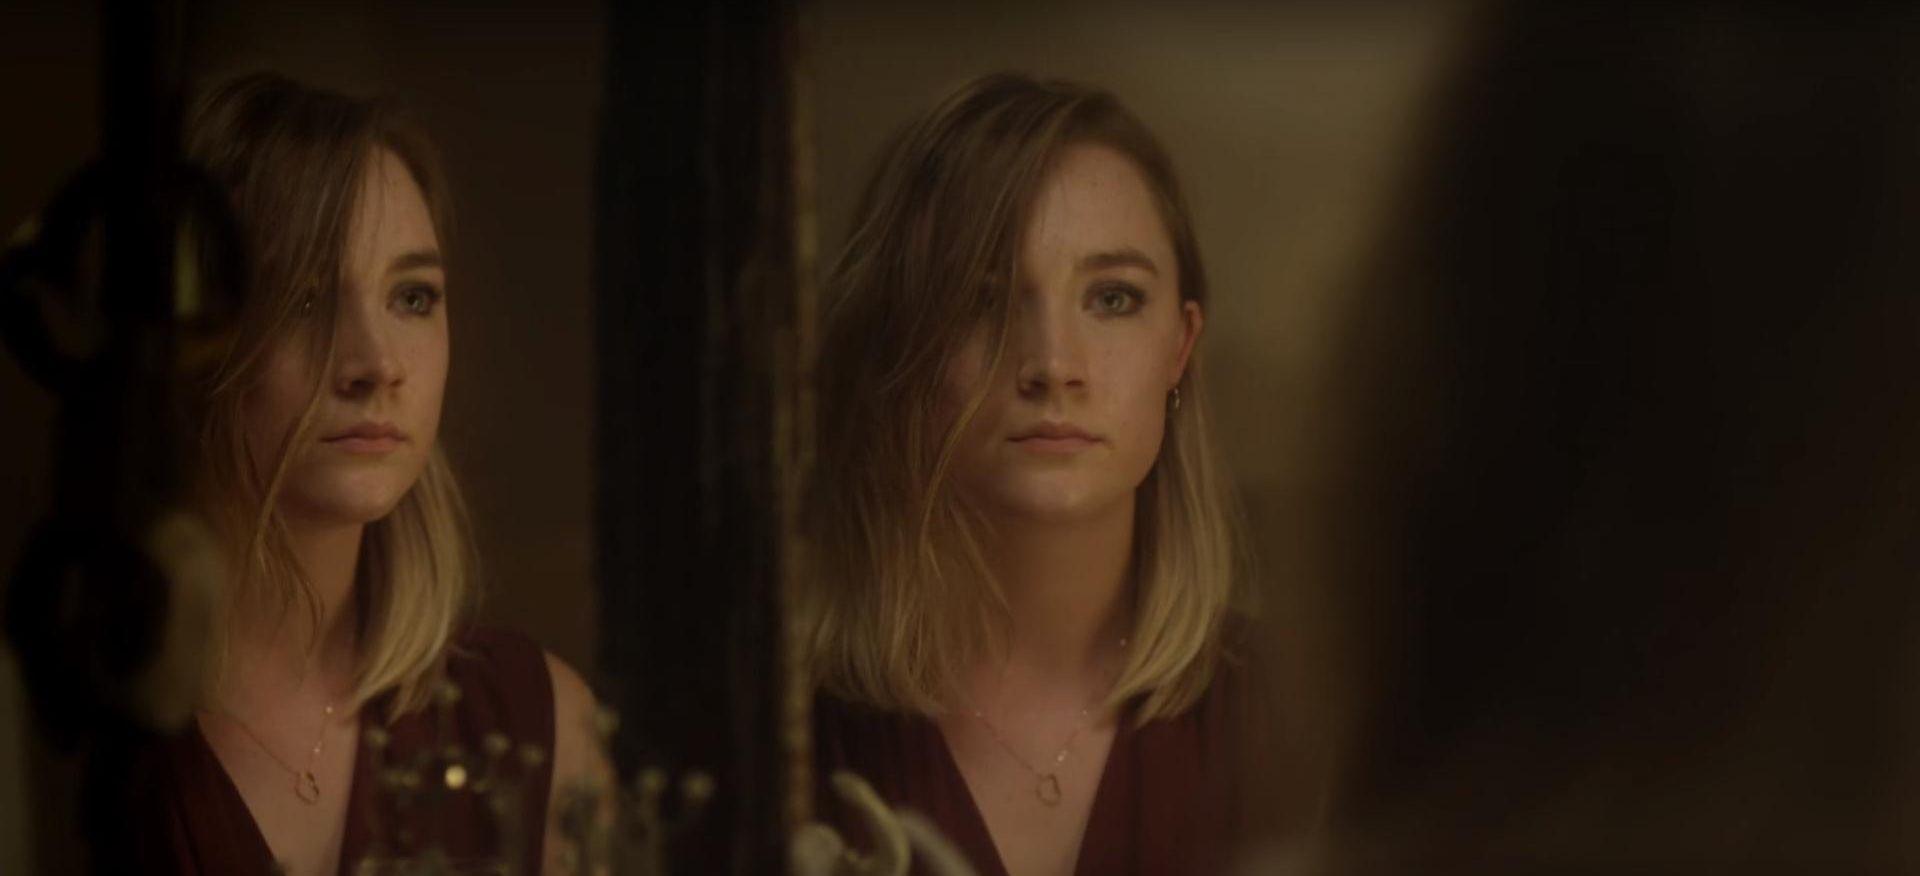 VIDEO: MALO DRUGAČIJE VALENTINOVO Hozier u novom spotu progovara o obiteljskom nasilju